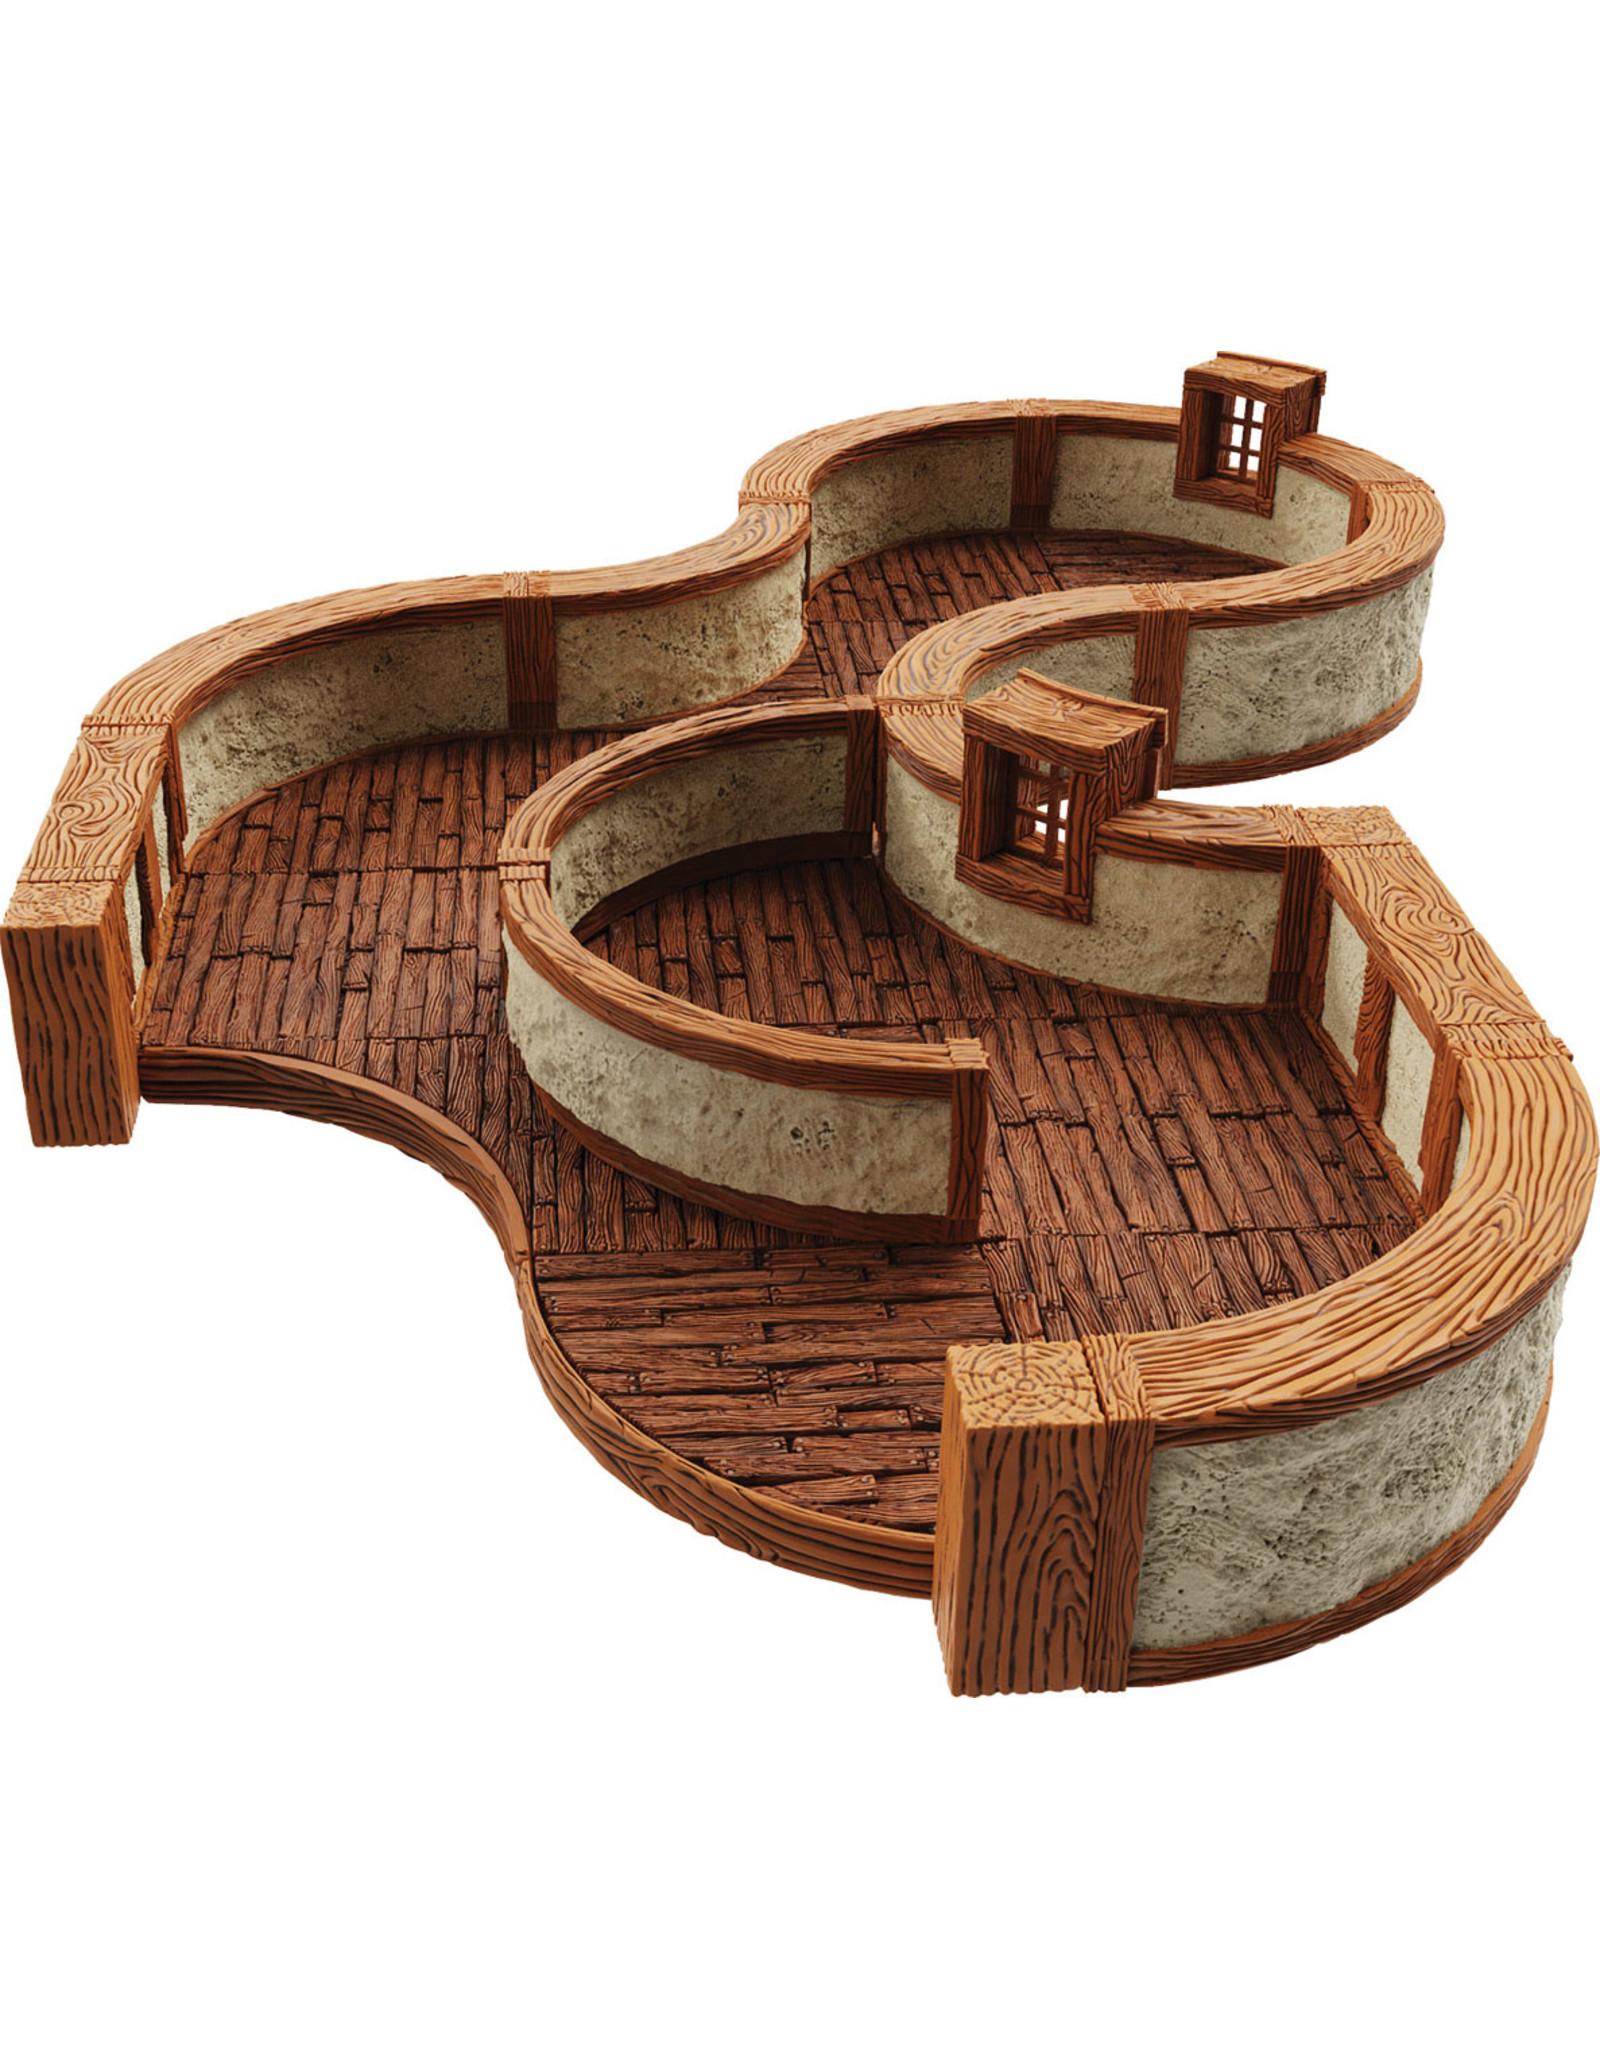 Wiz Kids WarLock Tiles: Town & Village III - Curves